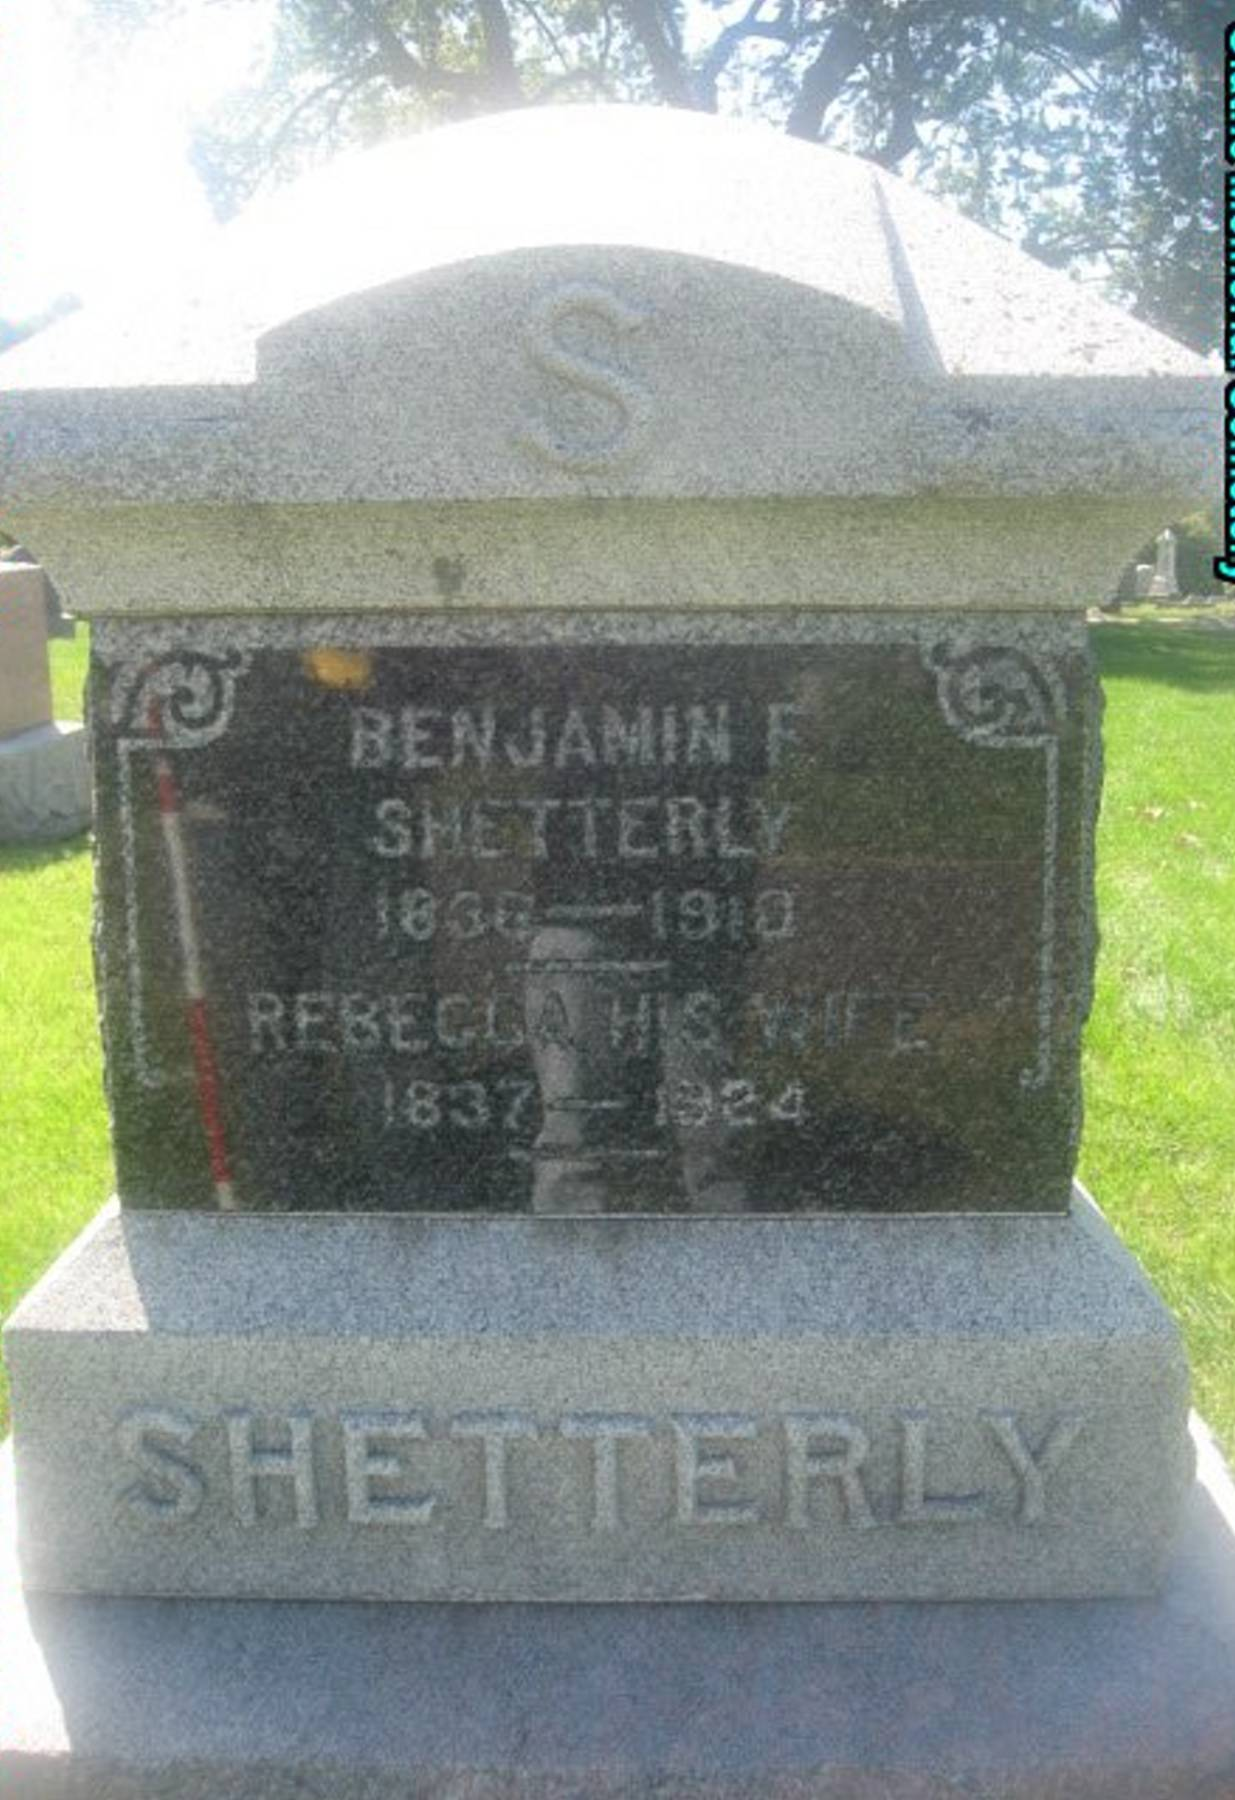 Benjamin F Shetterly